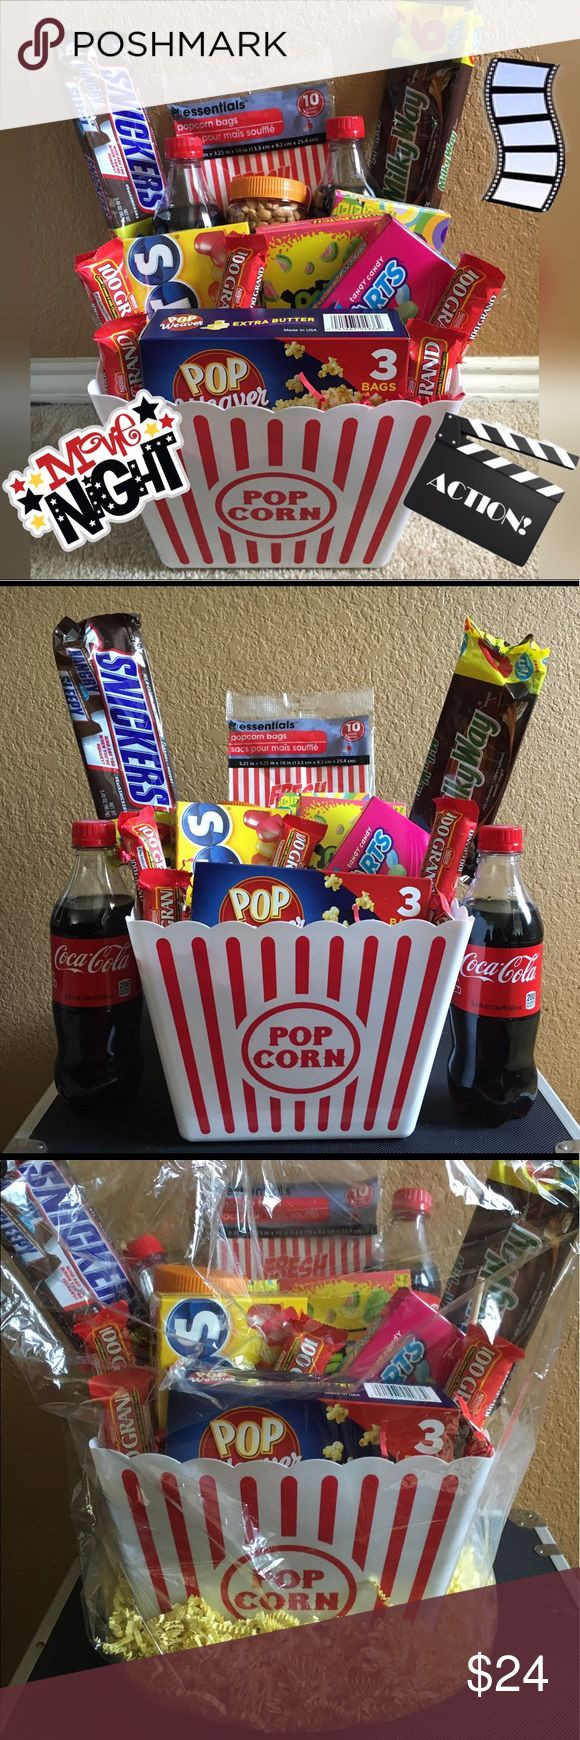 Popcorn Gift Baskets Ideas  25 unique Popcorn t baskets ideas on Pinterest